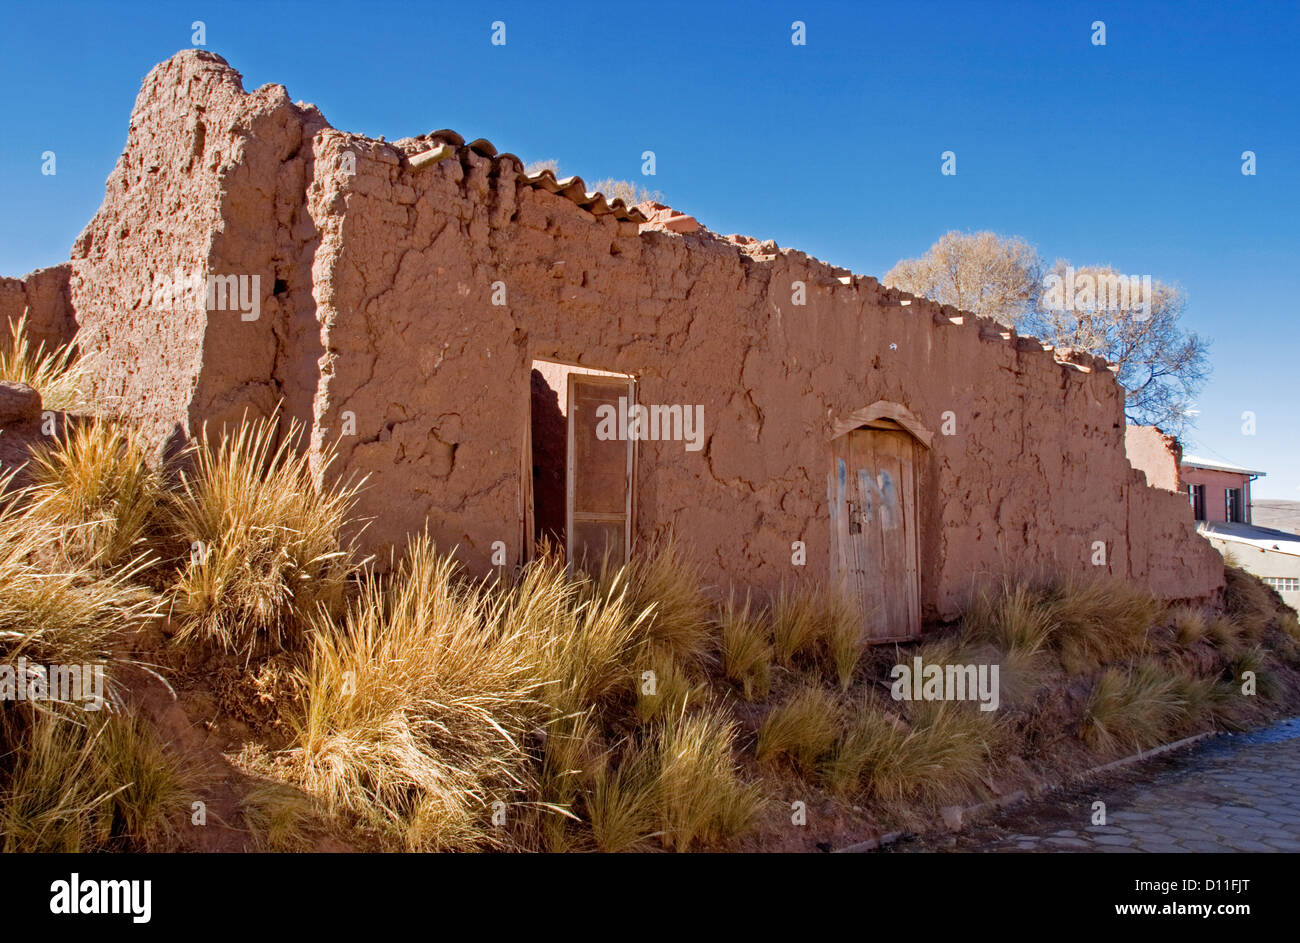 Ruins of adobe / mud brick house at Tiwanaku / Tiahuanacu village in the altiplano of Bolivia South America - Stock Image